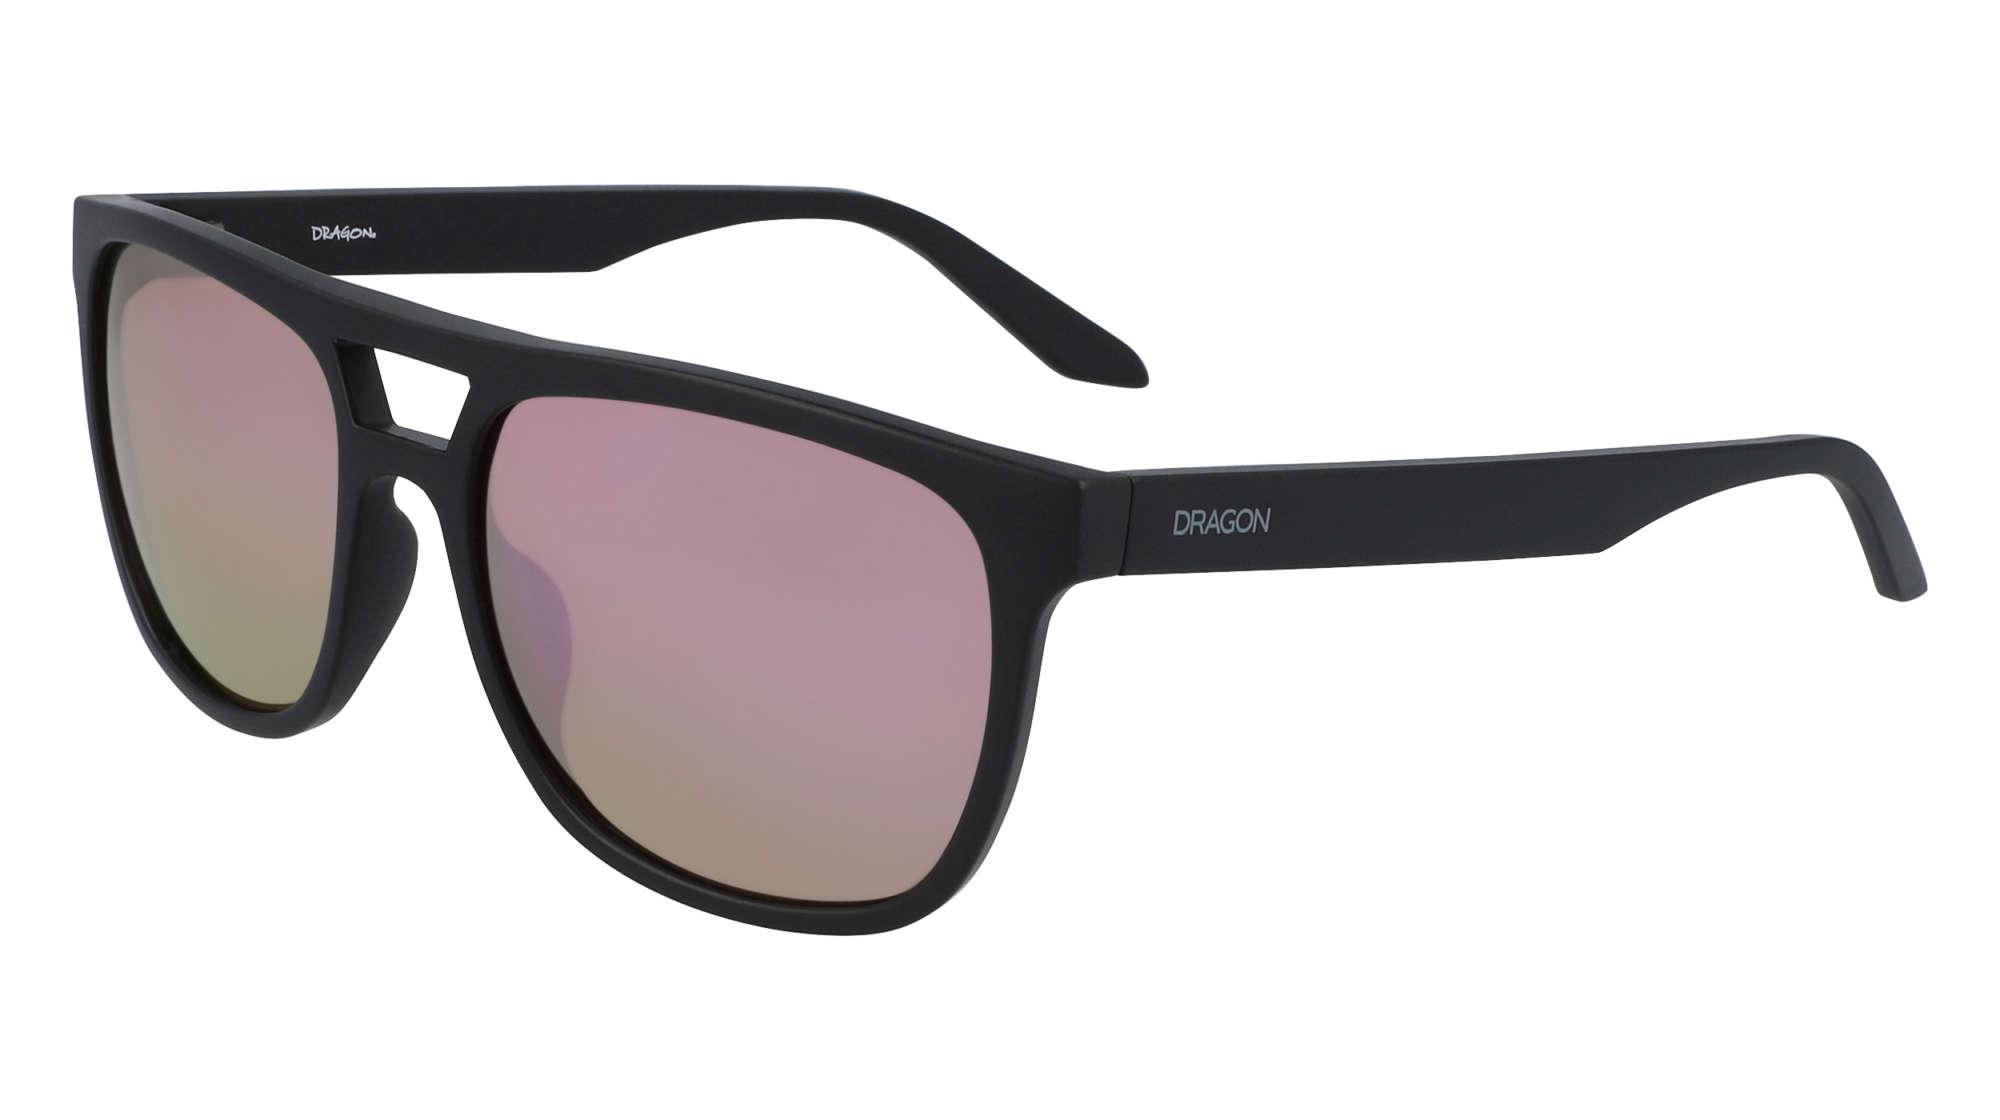 New-Goggles-and-Sunglasses-from-Dragon-Alliance-Cove-sunglasses